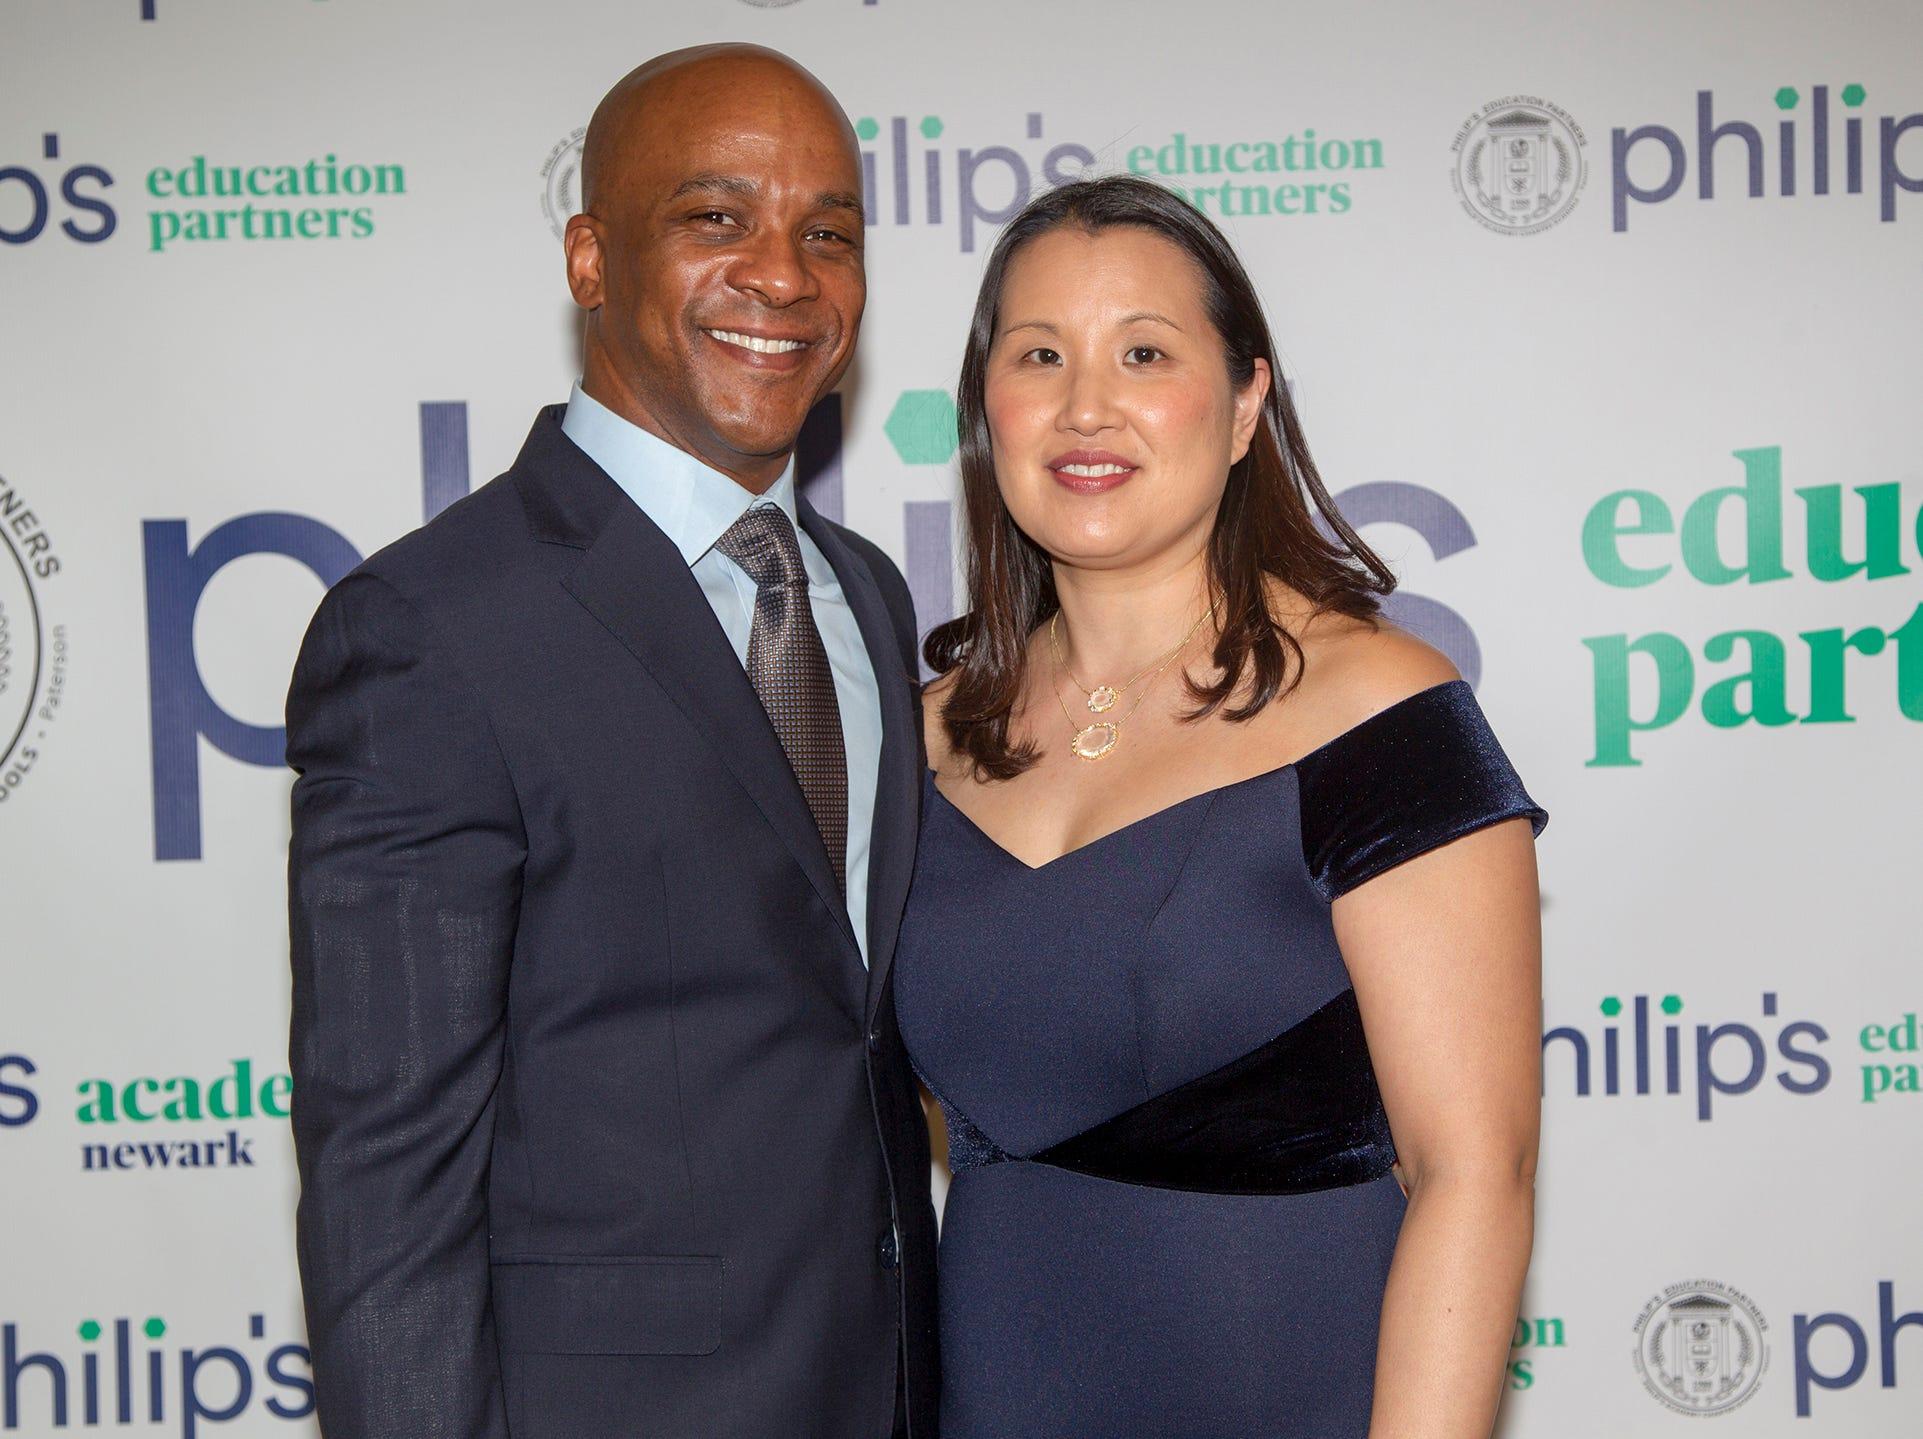 Jon and Gina Fortt. Philip's Education Partners host The Dream Maker 30th anniversary gala at The Mezzanine in Newark 3/29/2019.